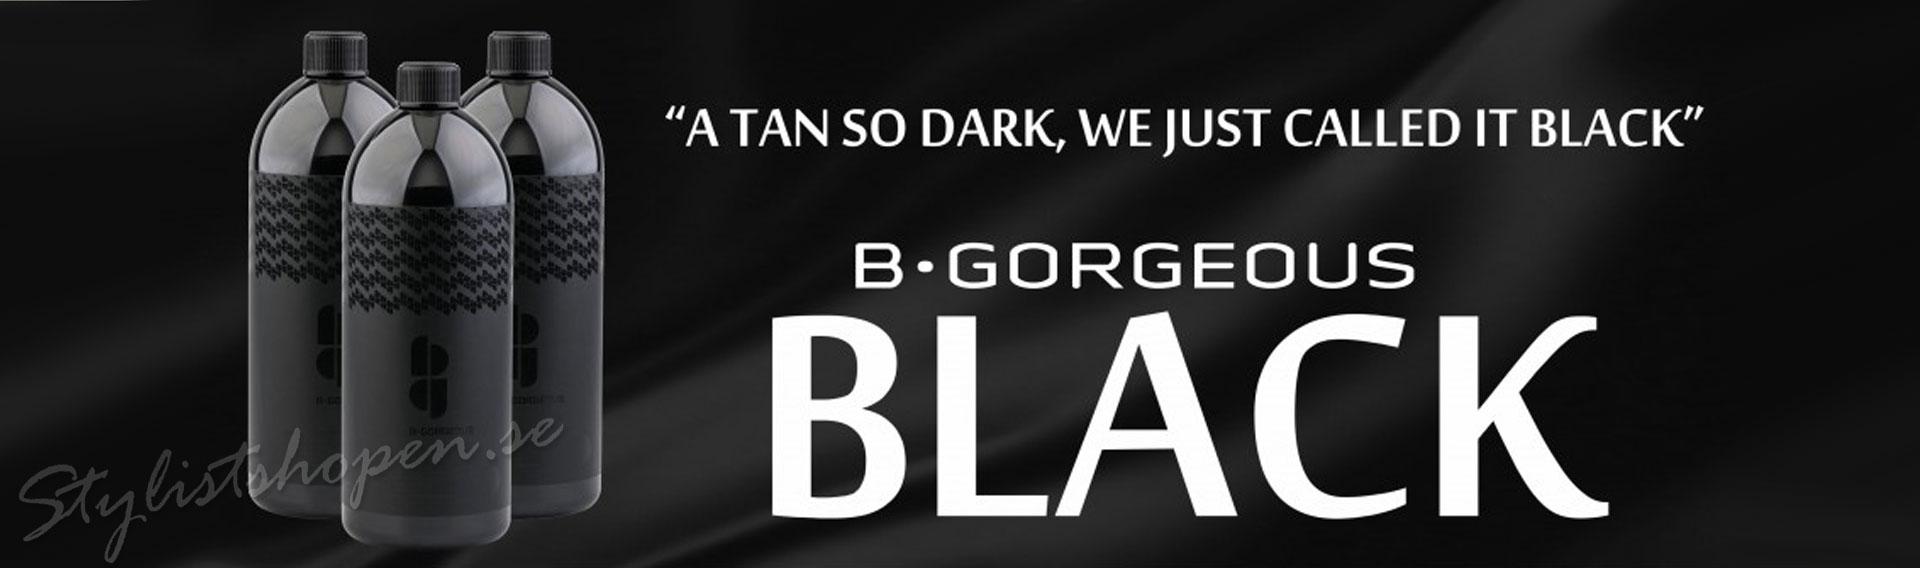 black-b_1920x568